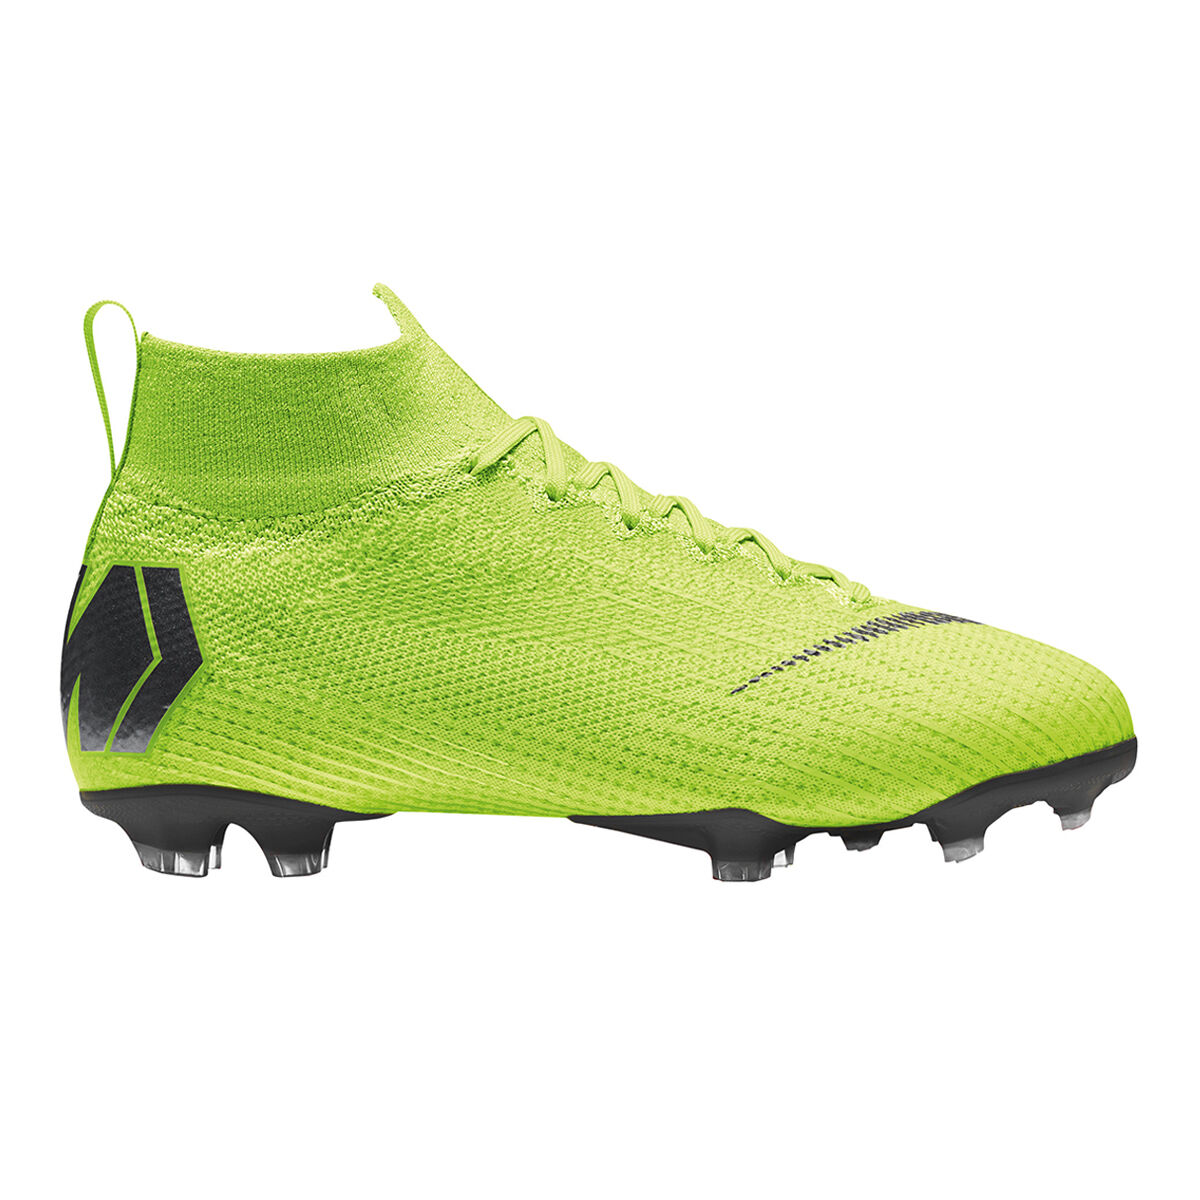 Nike Mercurial Superfly V FG ACC High EA Sports Football Shoes Soccers  Orange Colorful Navy Blue 2824880b0c9c0